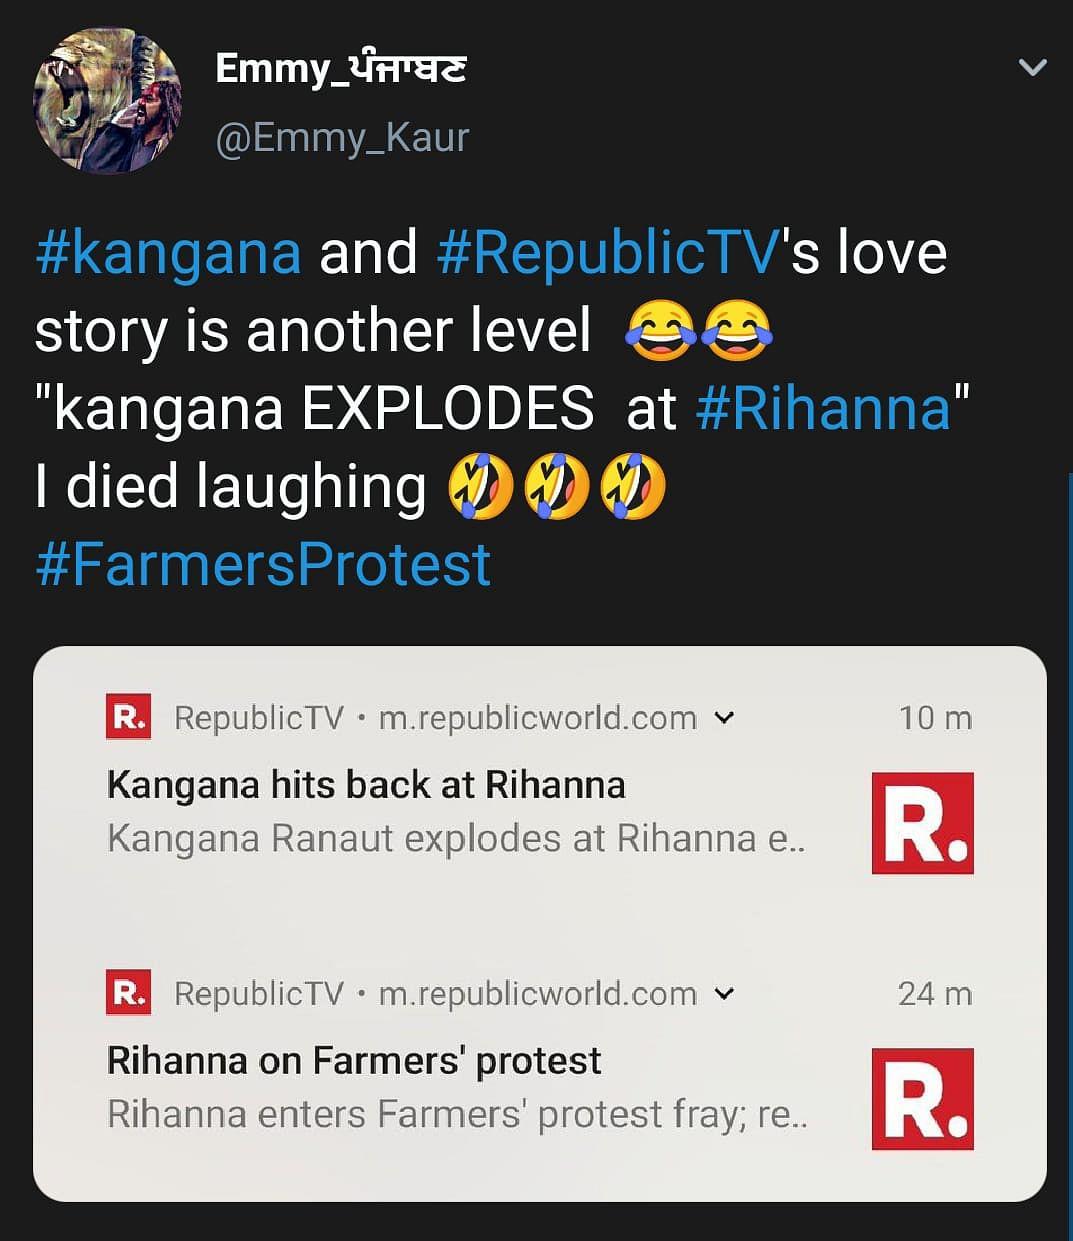 Netizens React to News Channels Reporting on Rihanna's Tweet